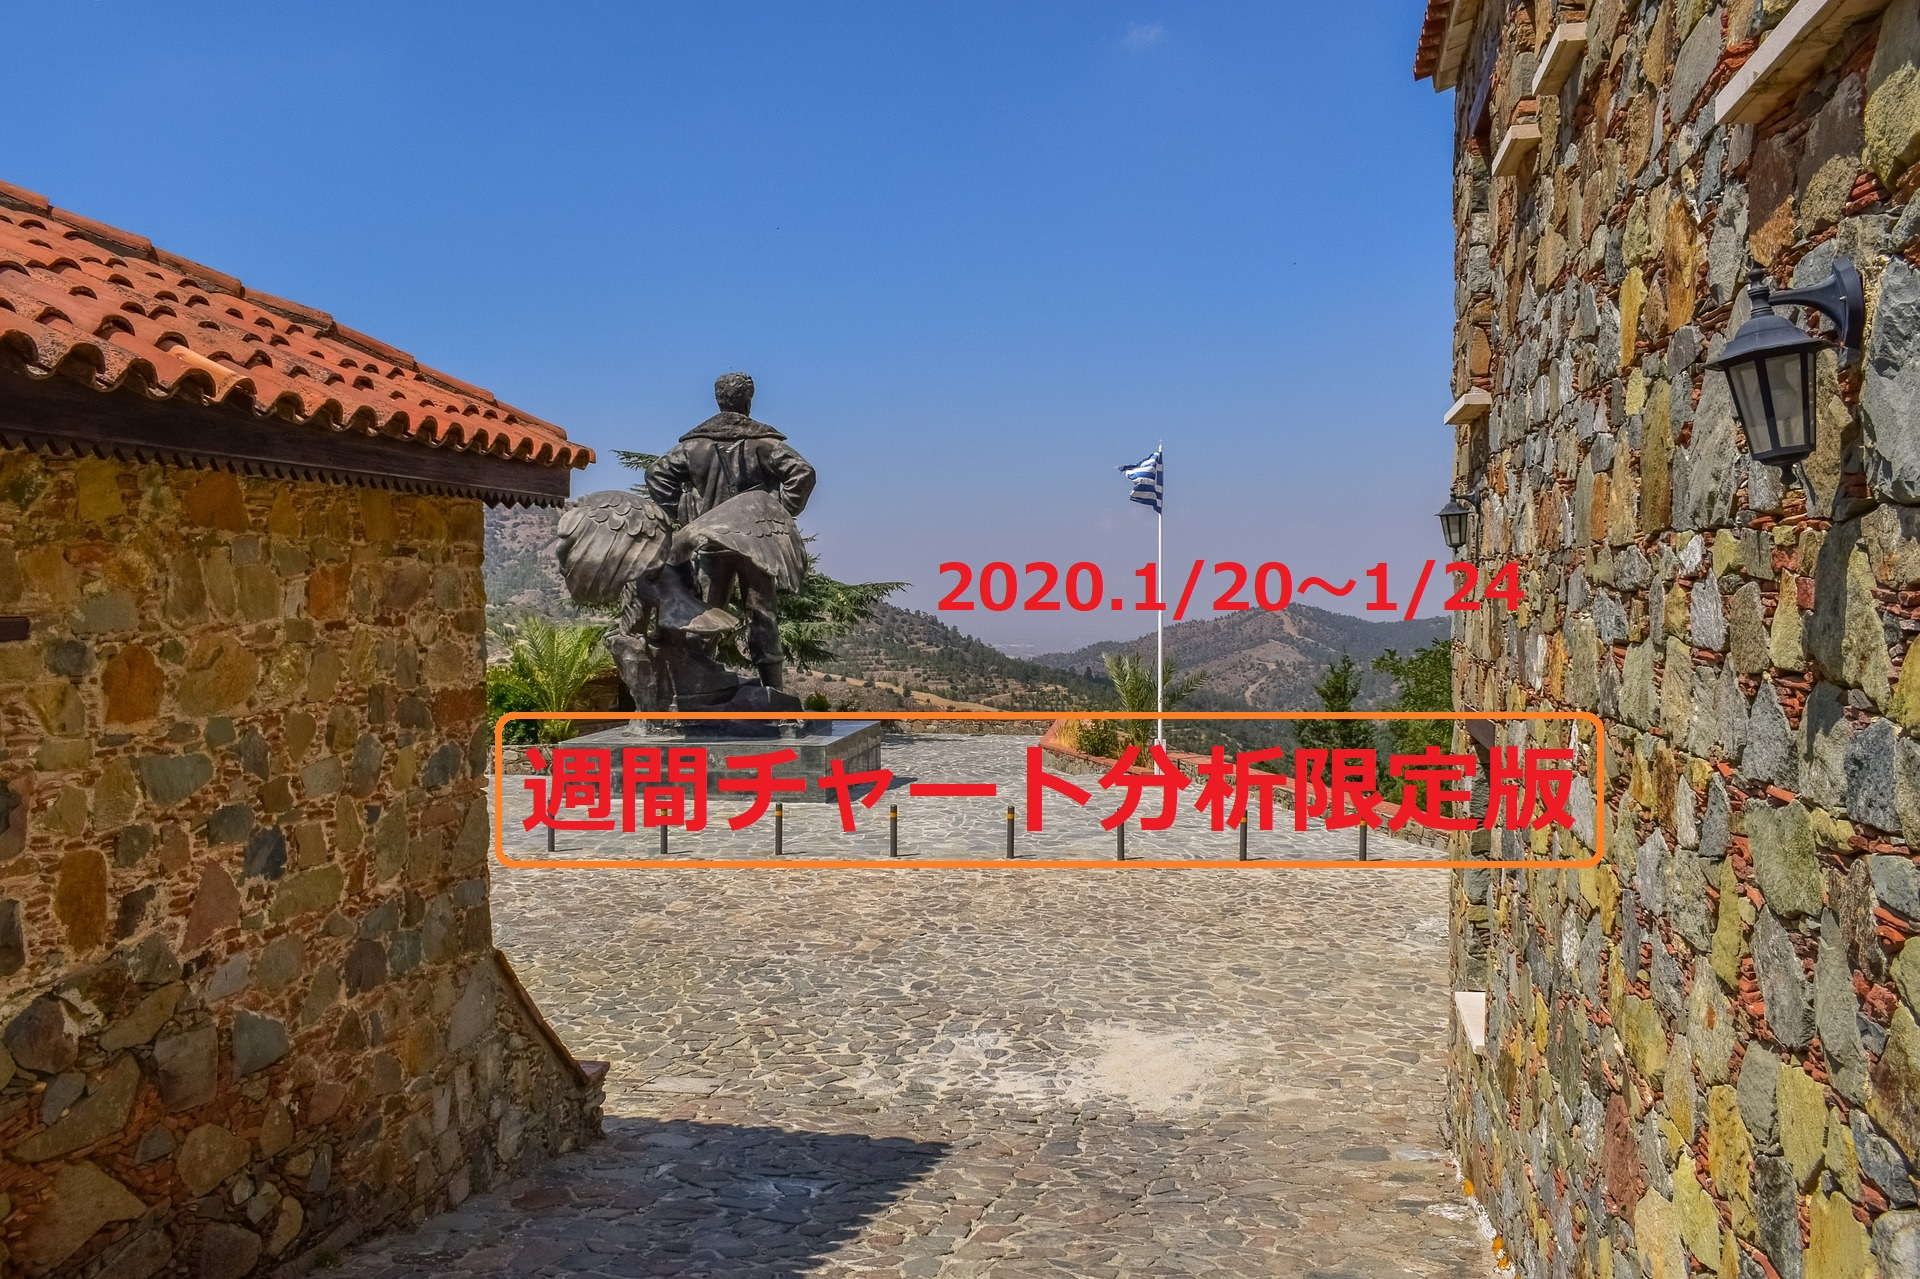 【FX】週間チャート分析限定版【2020.1/20~1/24】